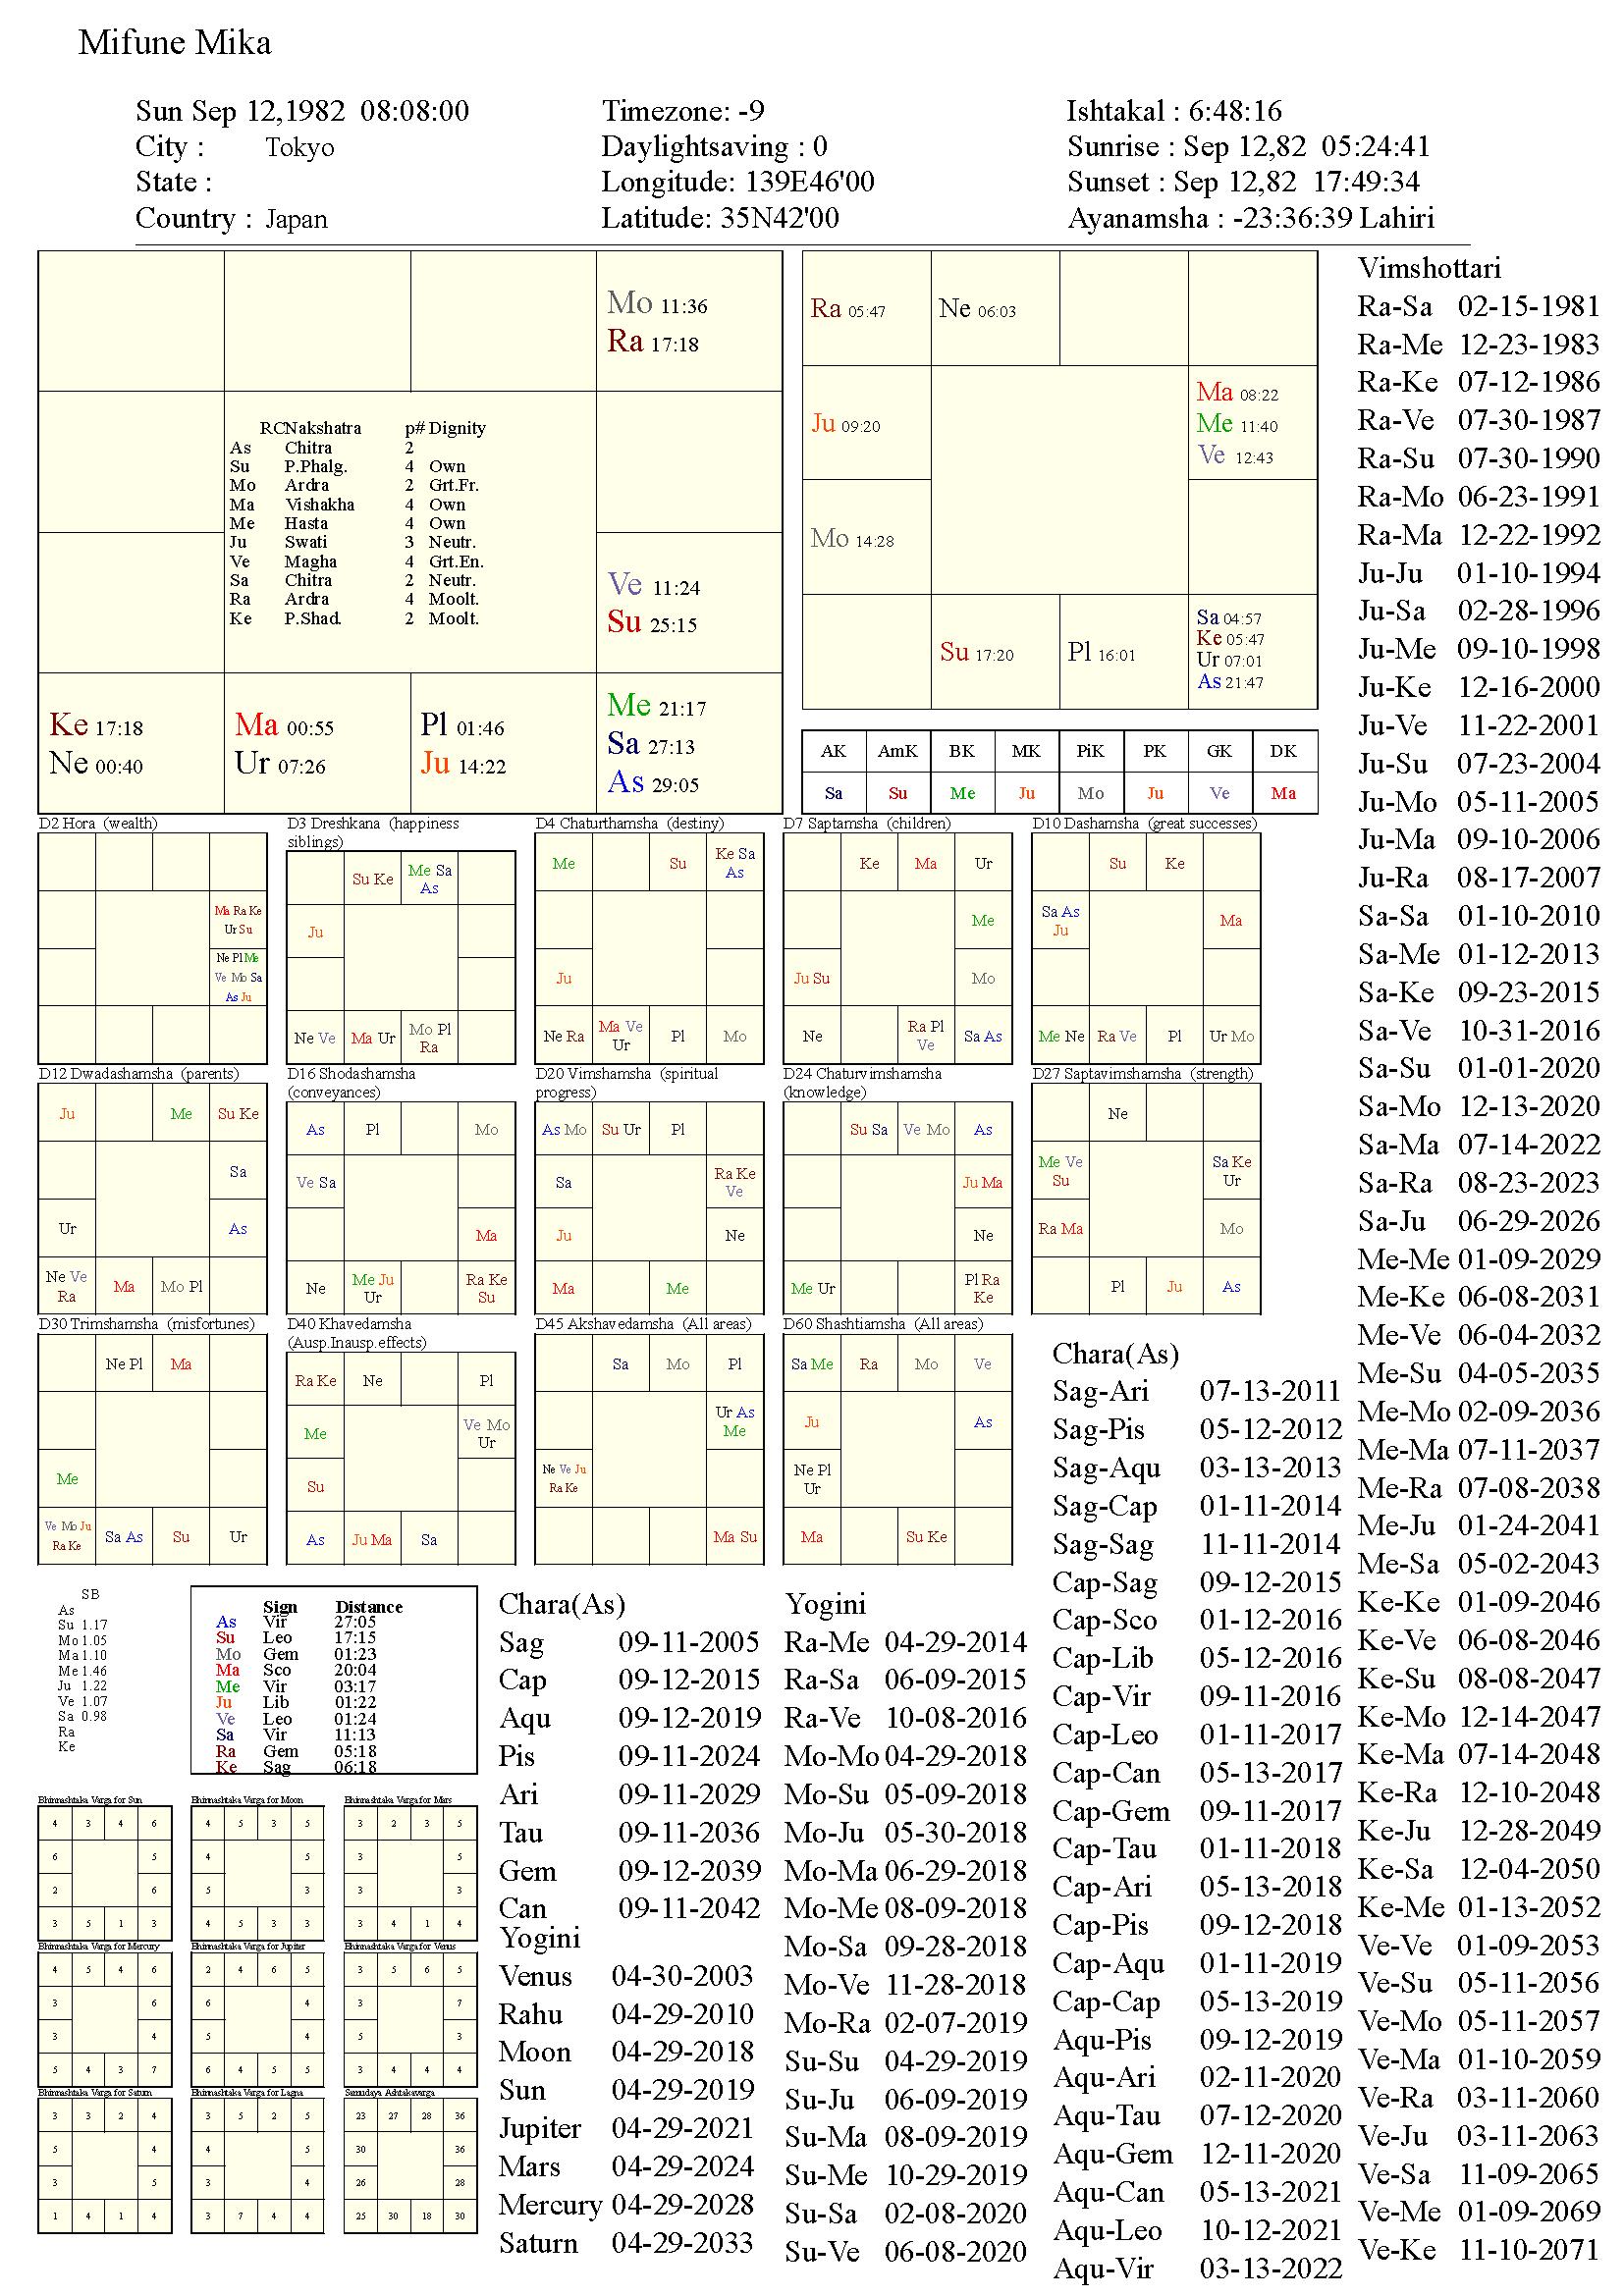 MifuneMika_chart